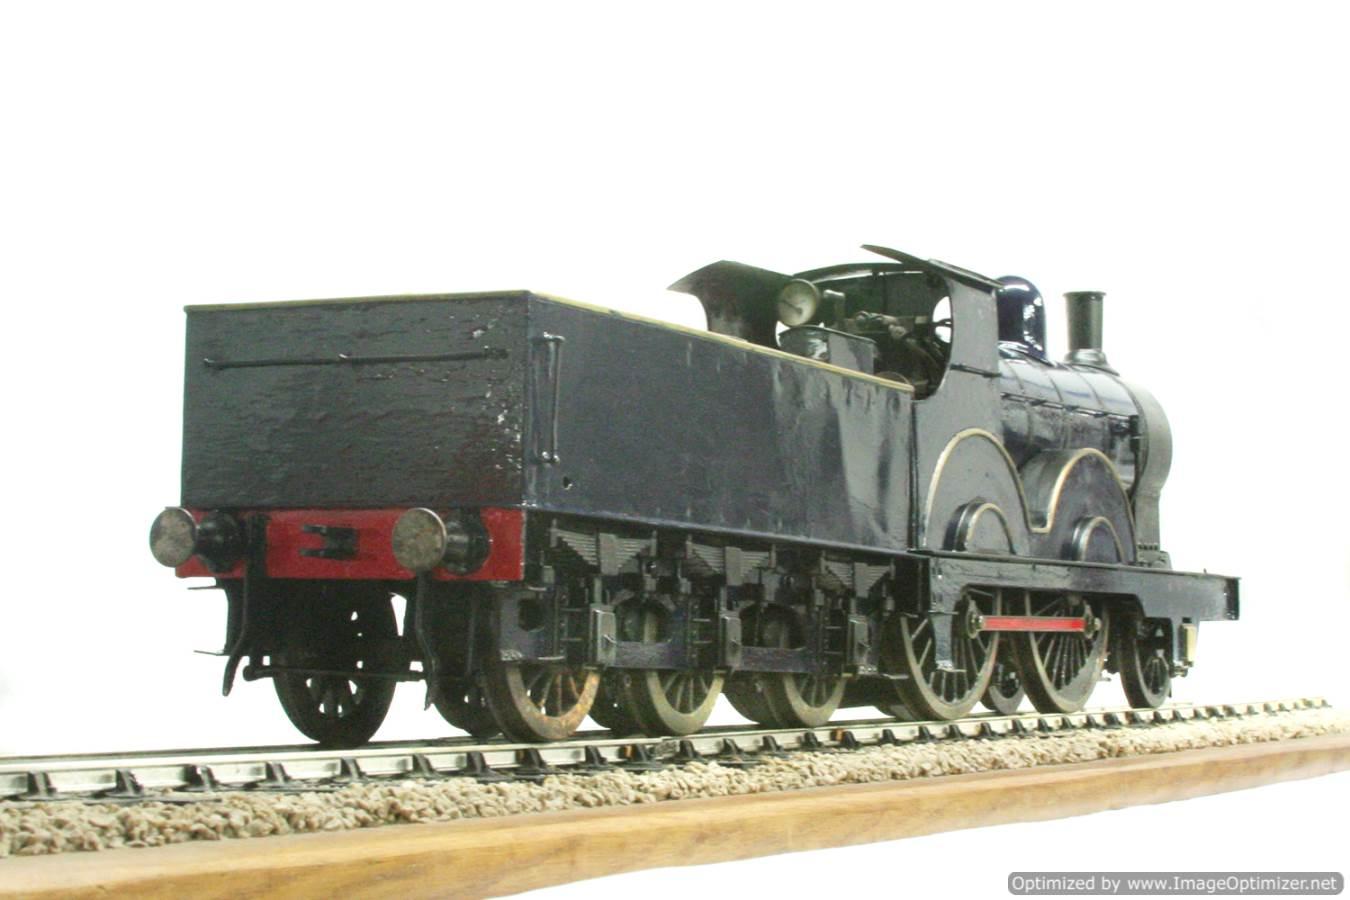 test Petrolea live steam locomotive for sale 02 Optimized